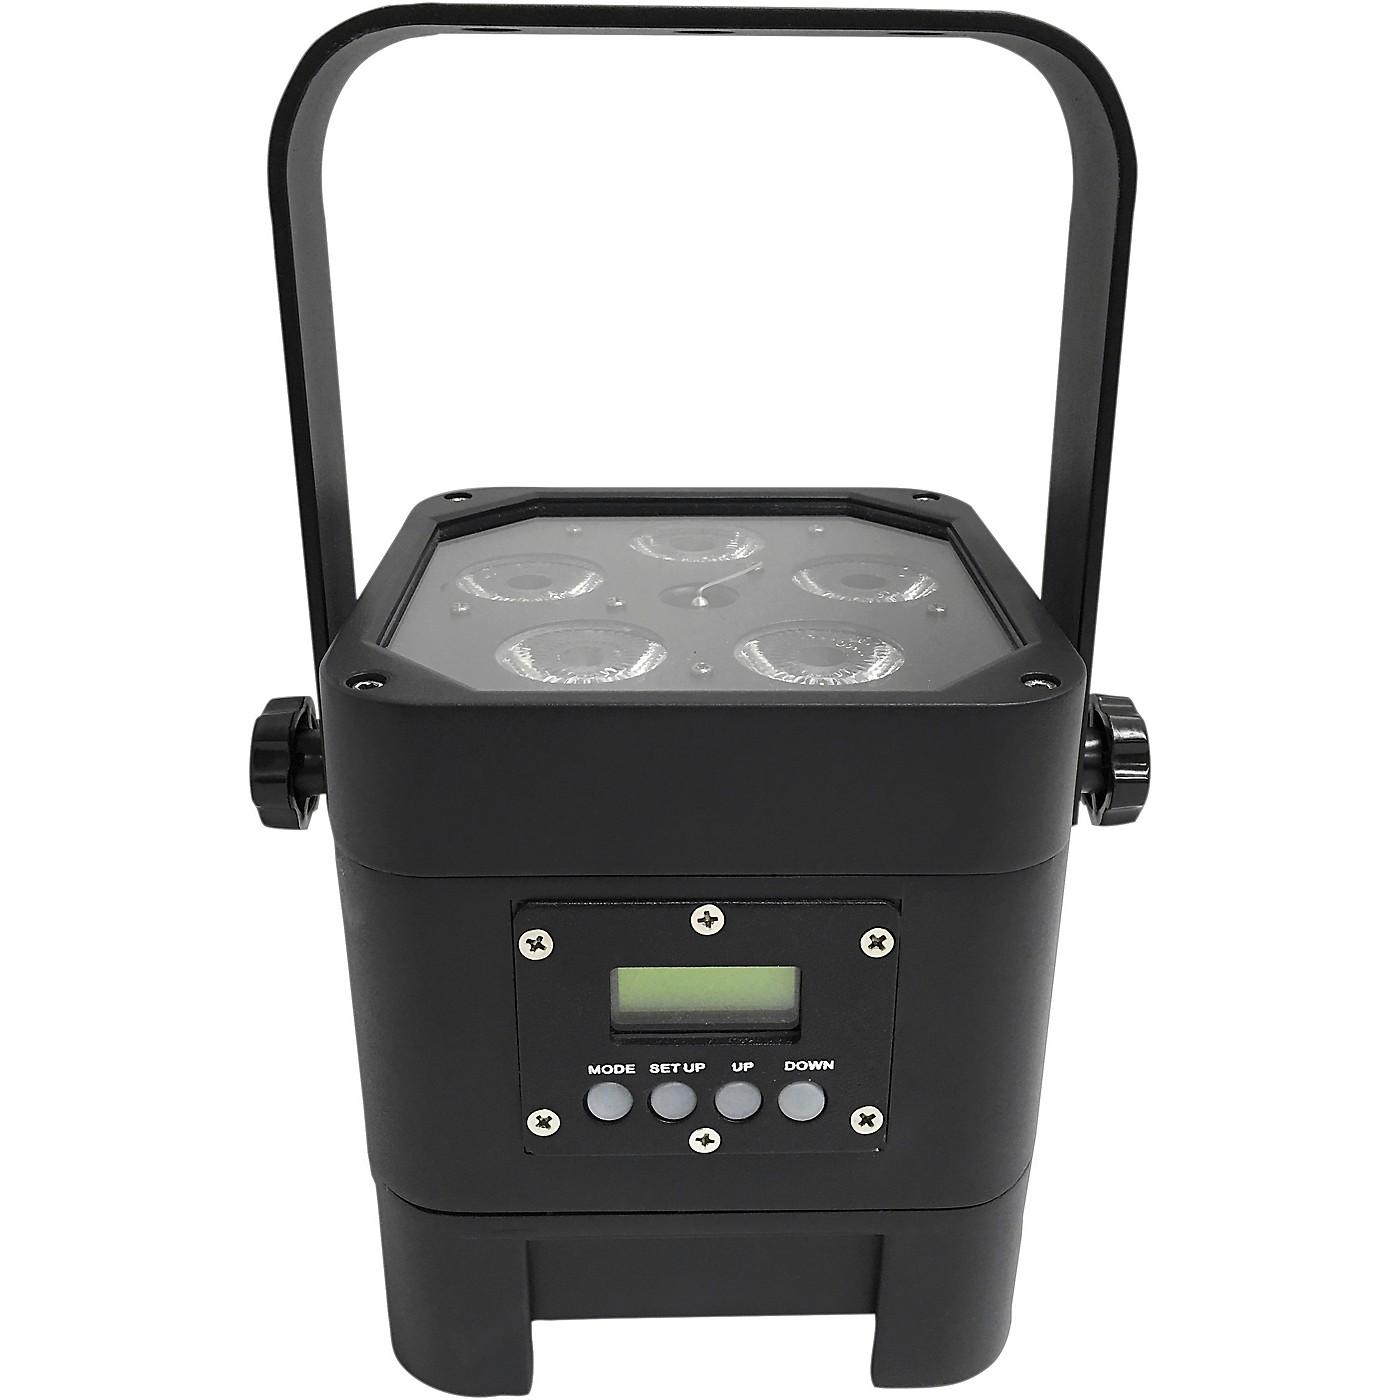 Eliminator Lighting Indy Hex Par Wireless Outdoor RGBWA+UV LED Wash Light thumbnail